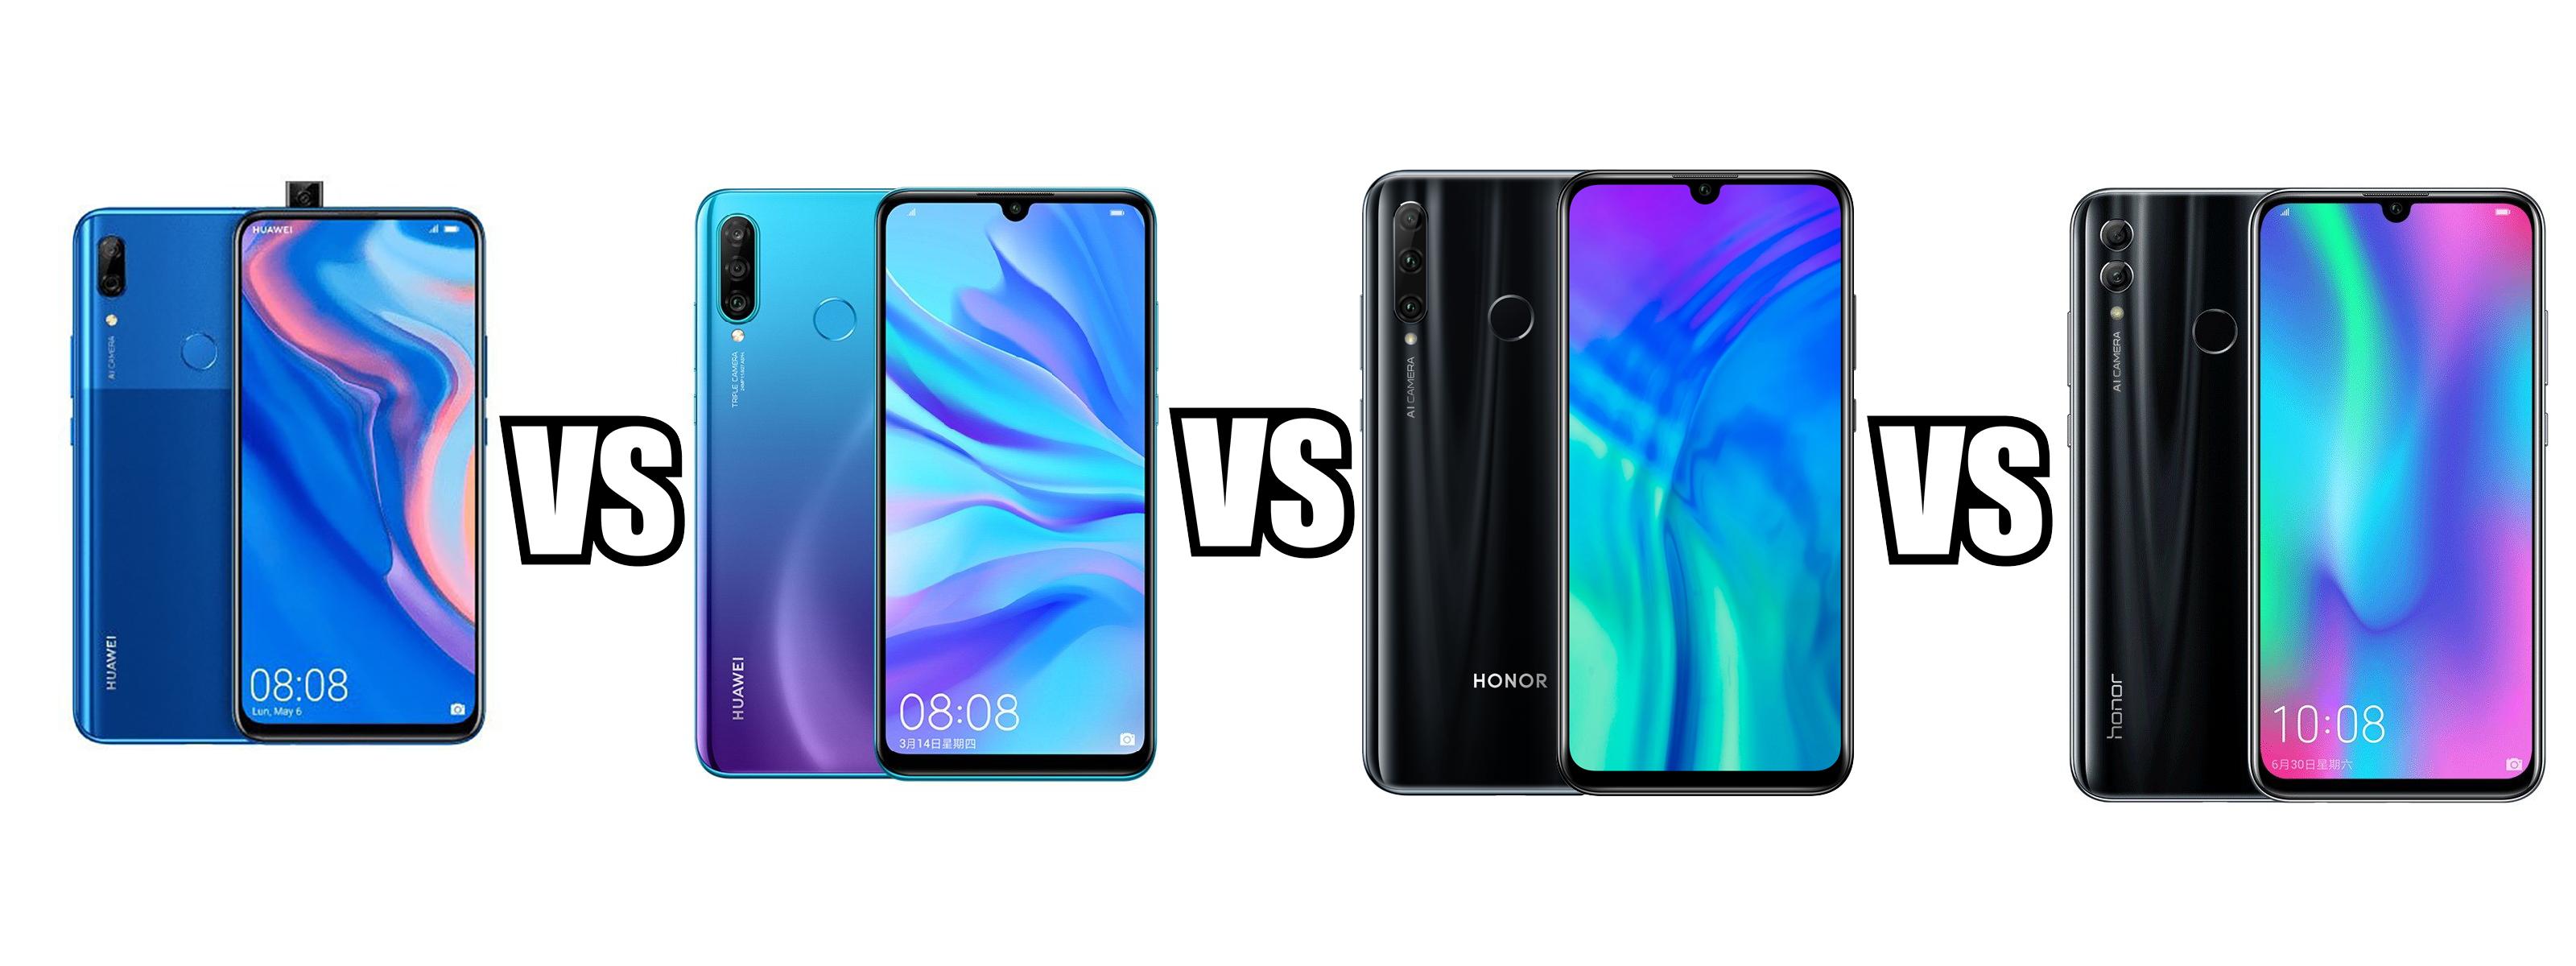 Huawei P Smart Z Vs P30 Lite Vs Honor 20 Lite Vs Huawei P Smart 2019 Vs Honor 10 Lite Point And Shoot Camera Huawei Android 9